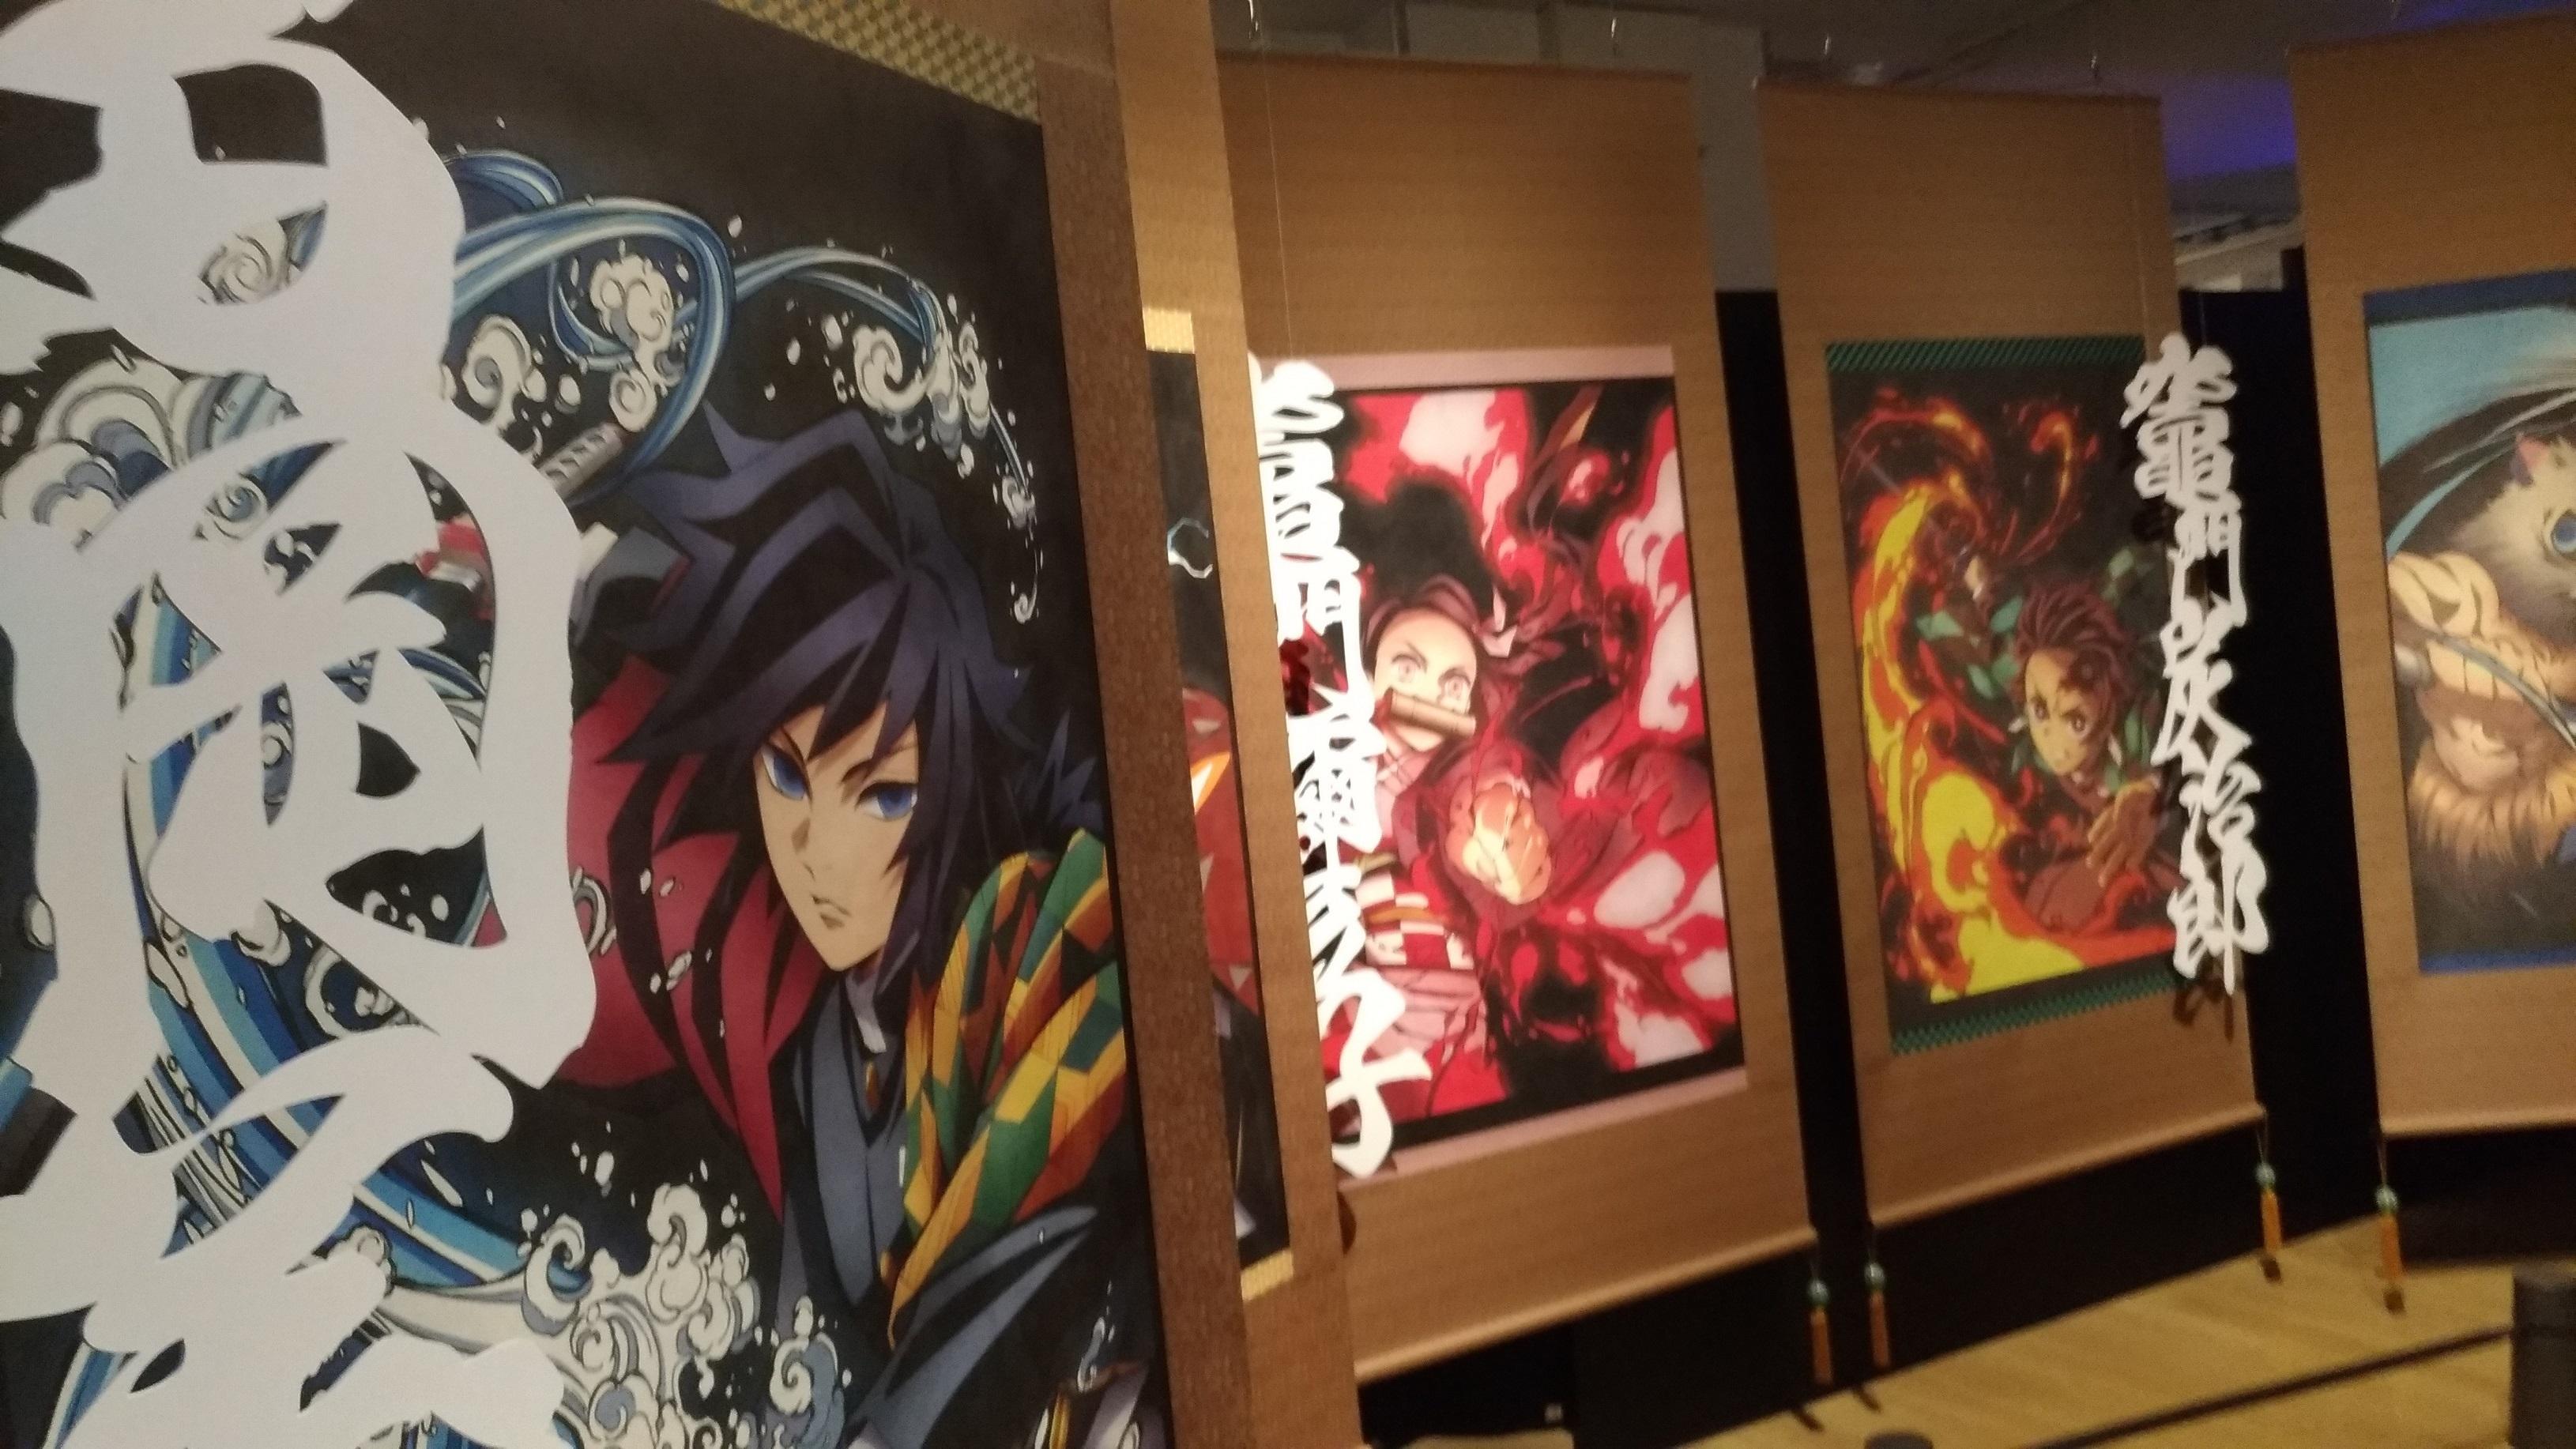 kimetsu_yaiba_2020_1219_events_kobe_.jpg